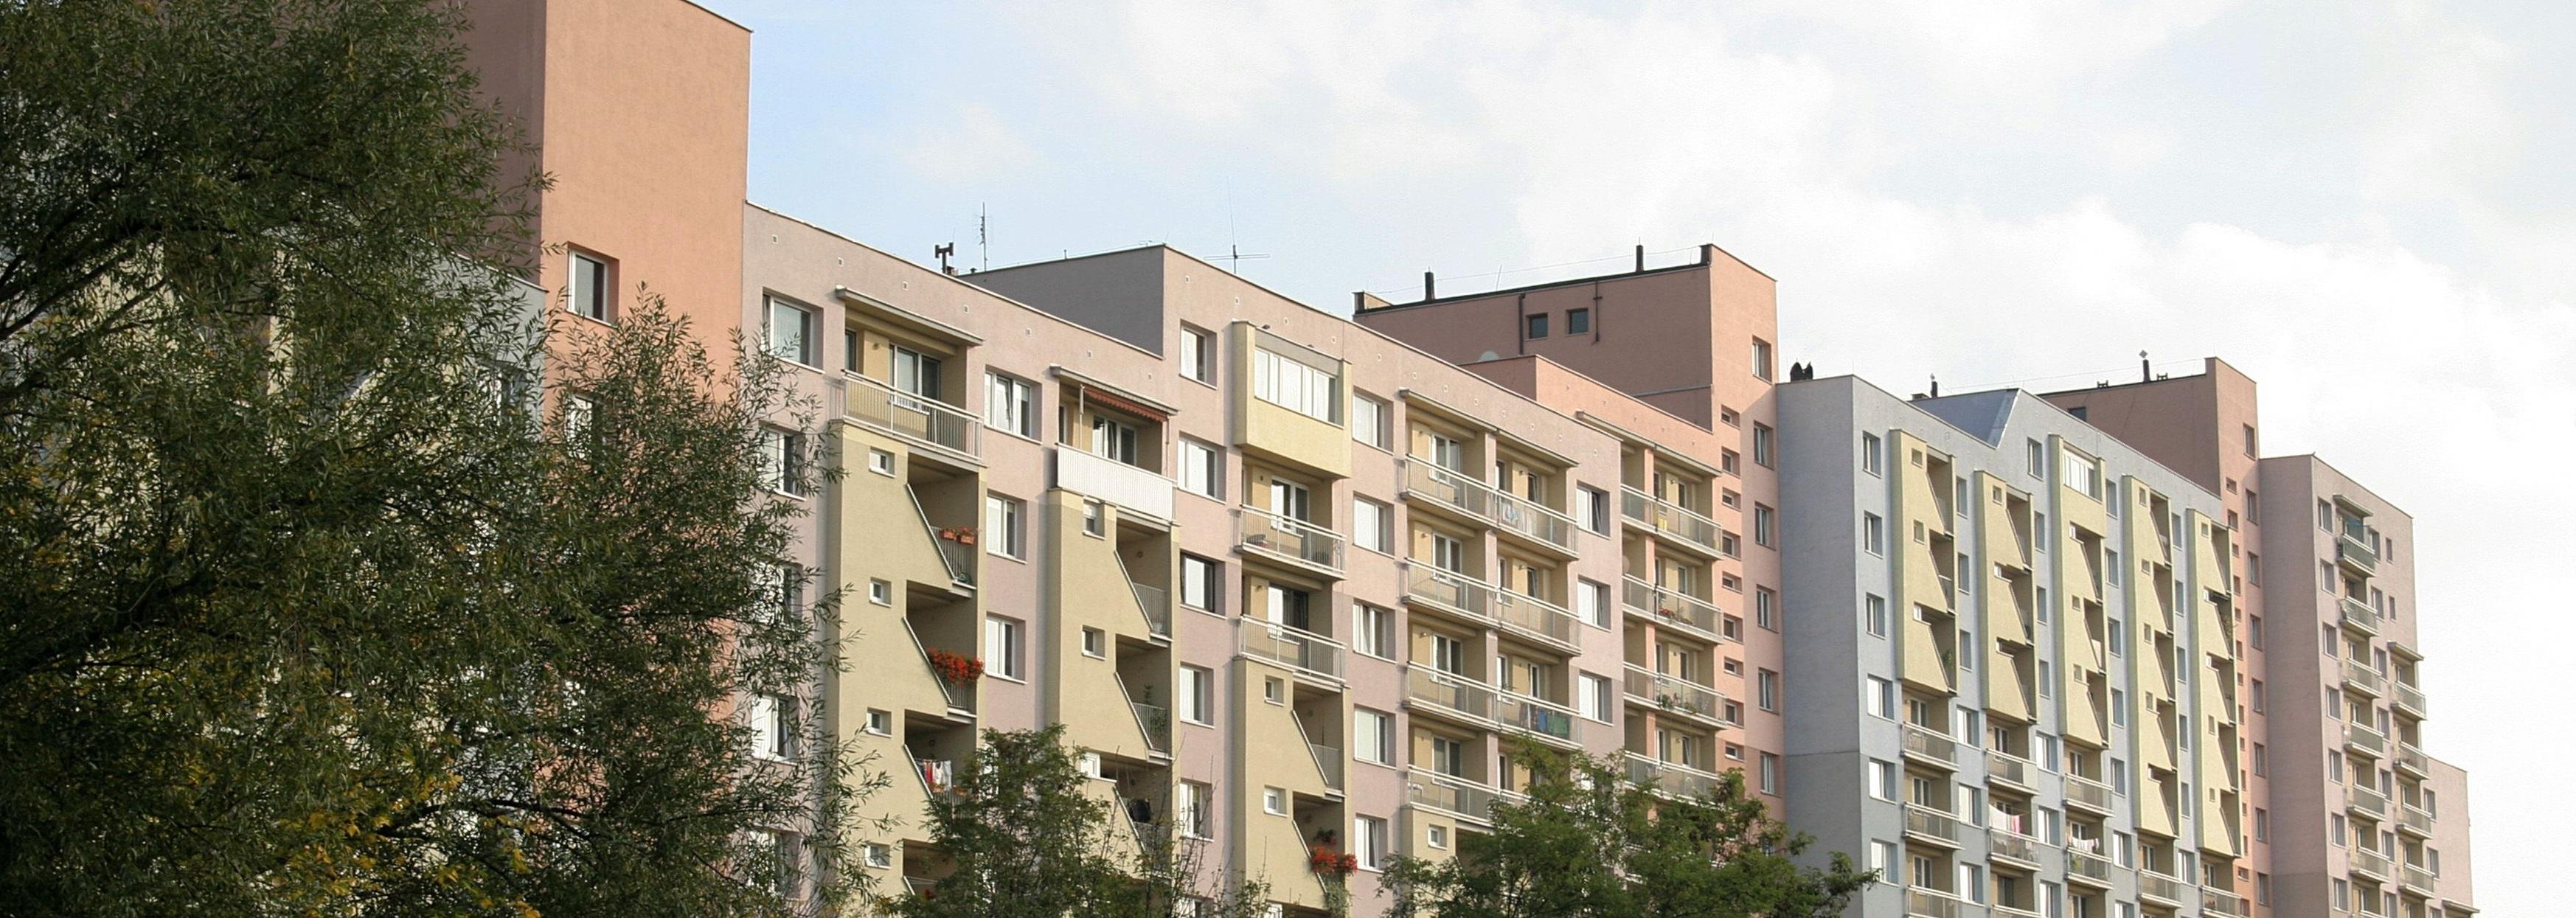 Chorzowska